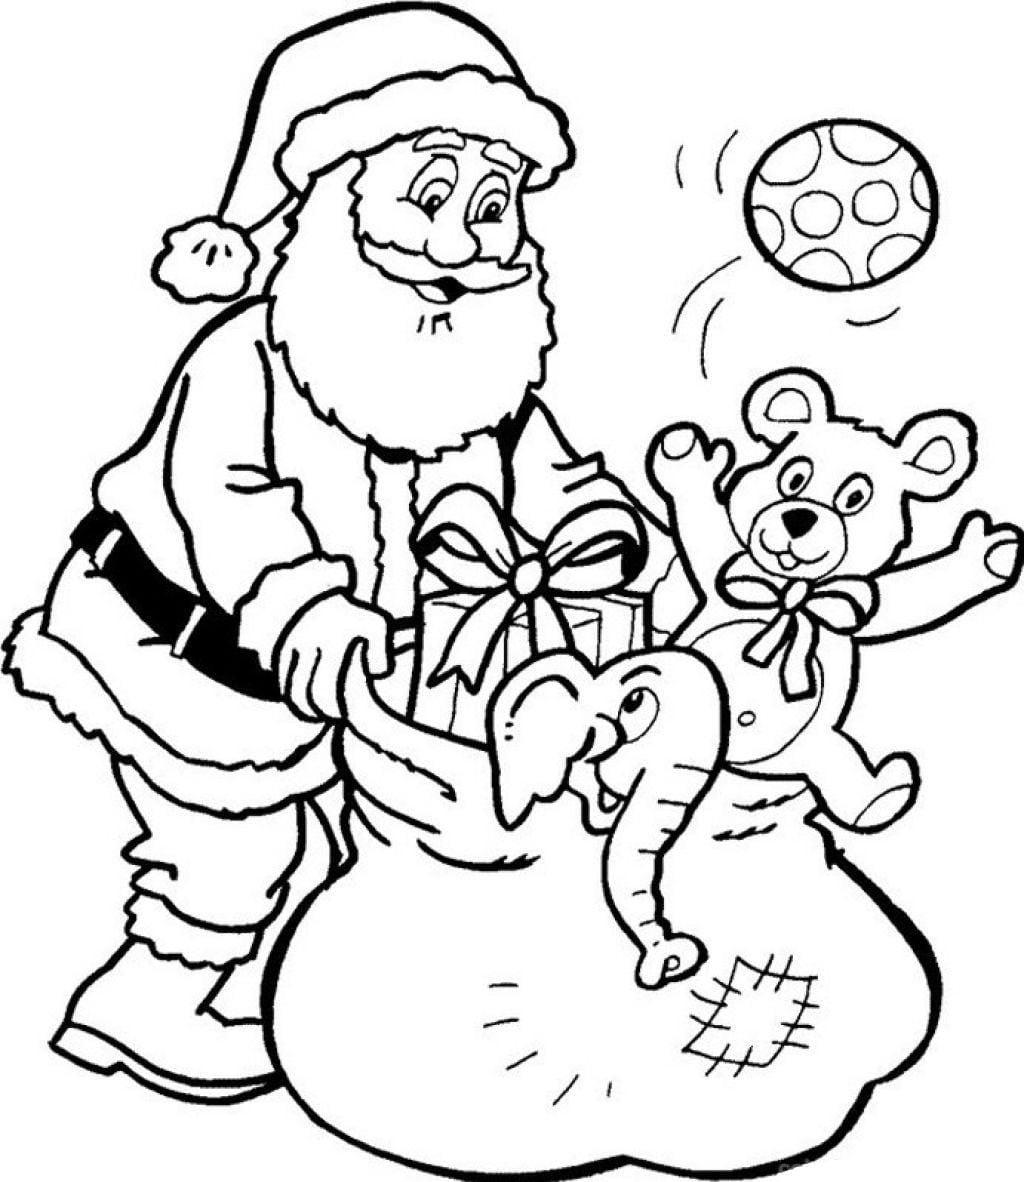 Printable Santa Claus Coloring Page Printable Santa Claus Coloring